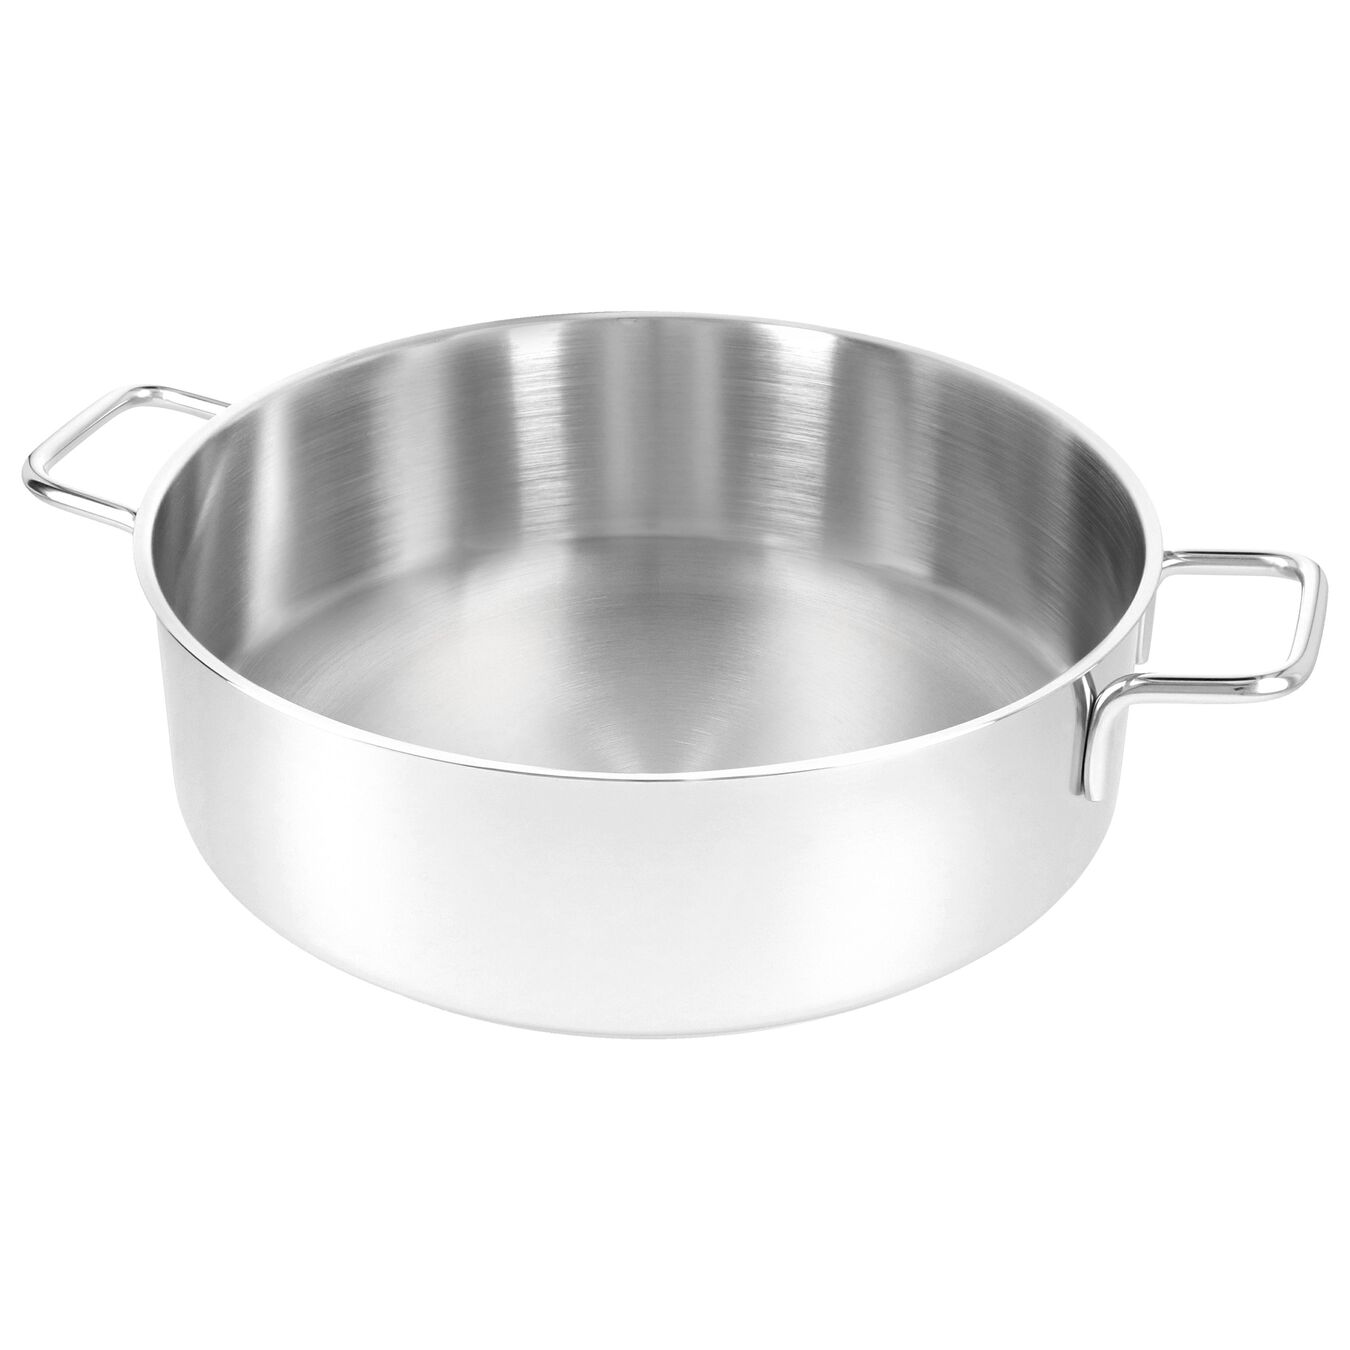 Kookpan met glazen deksel 24 cm / 2.8 l,,large 3